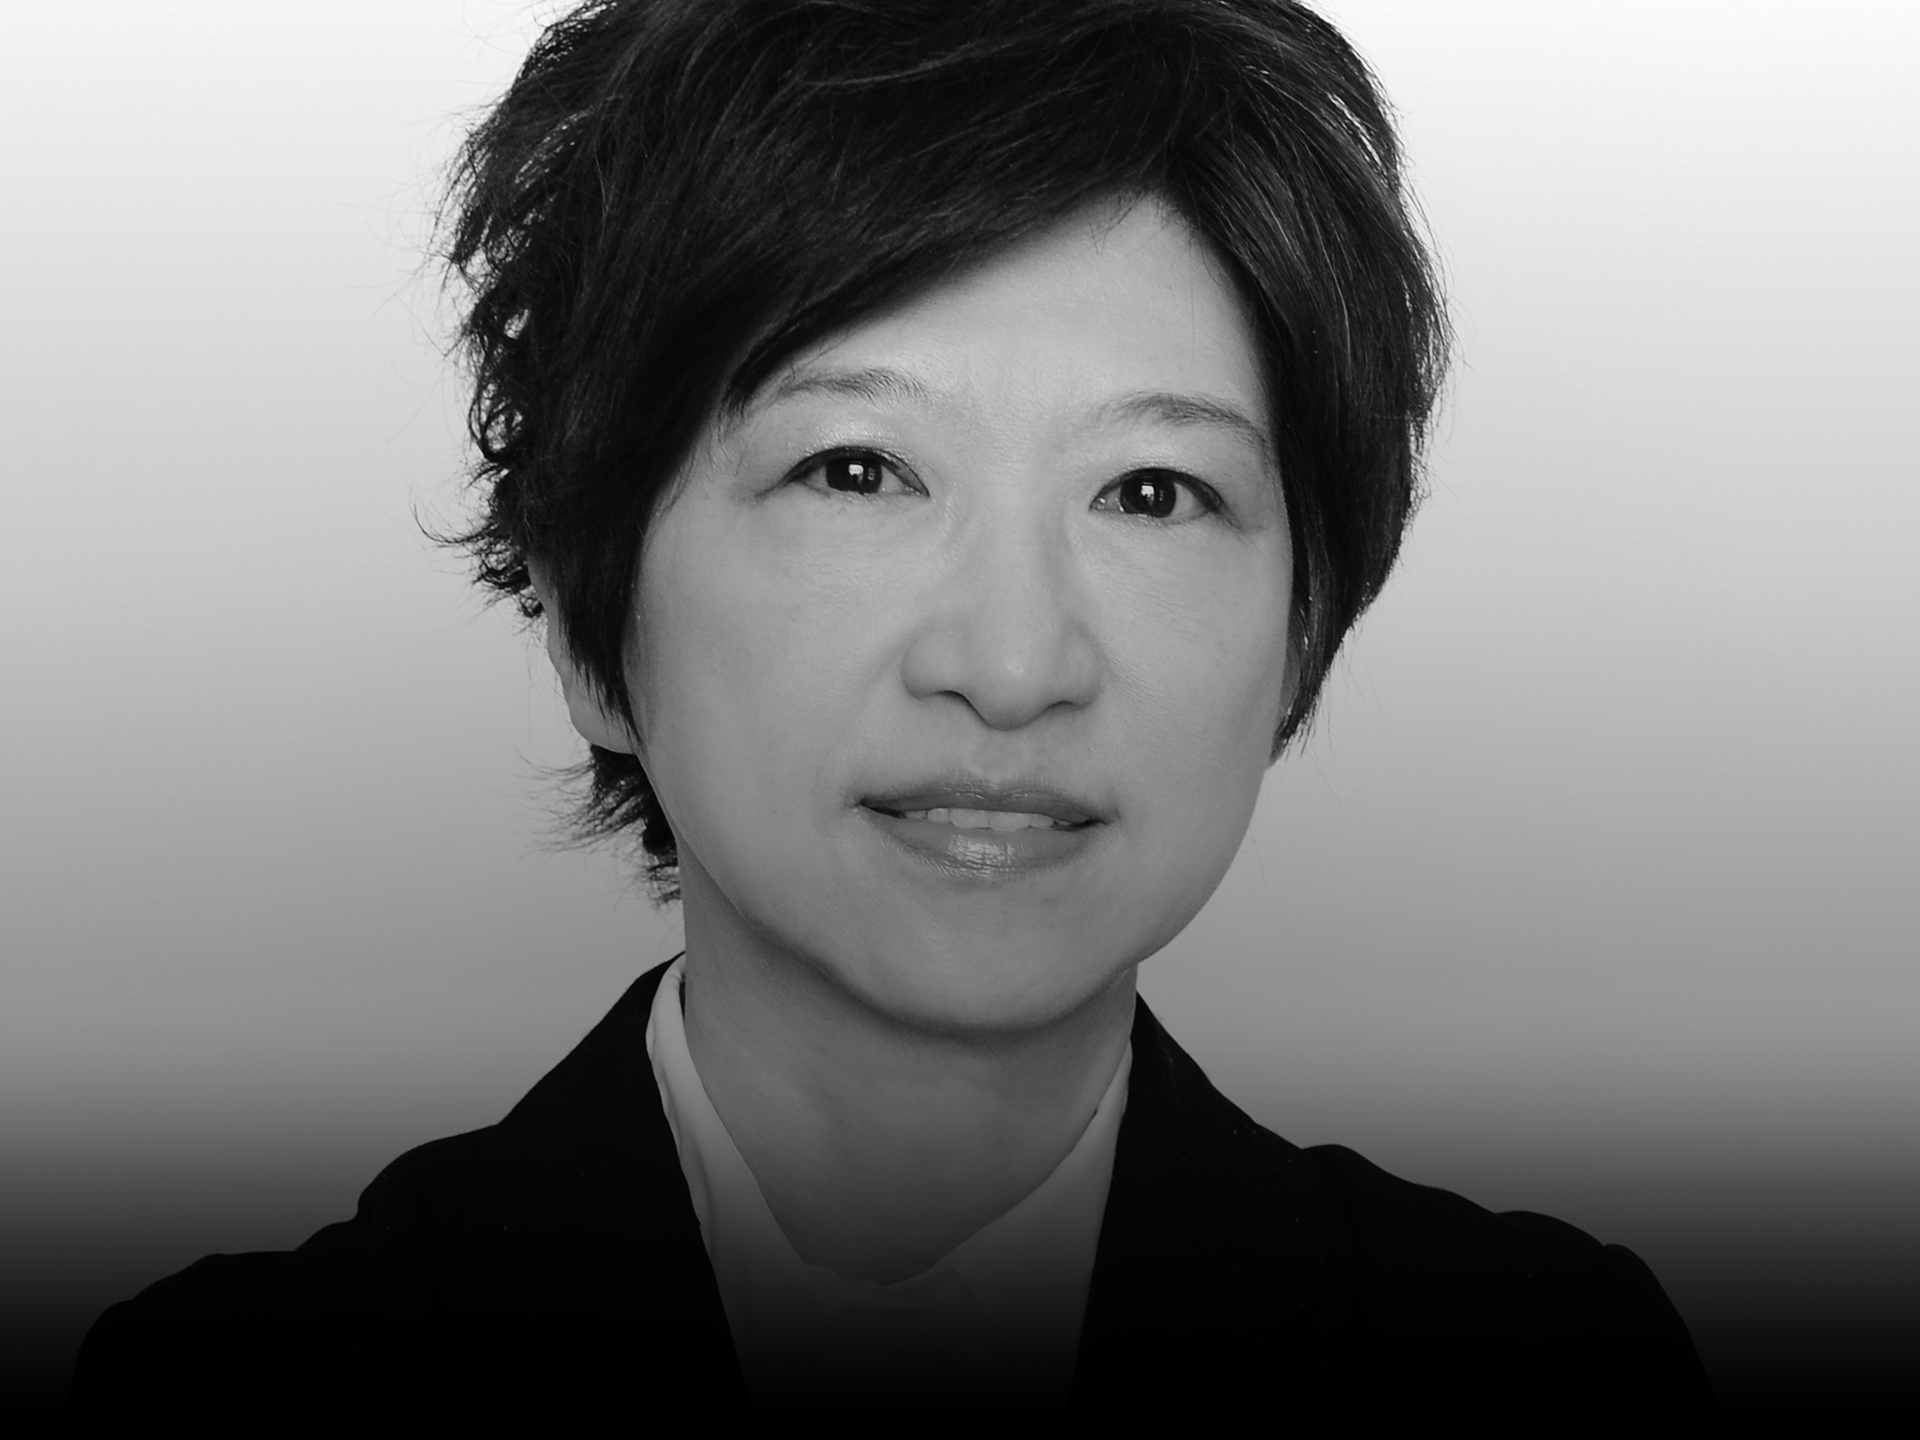 Image of Sheena Jeng